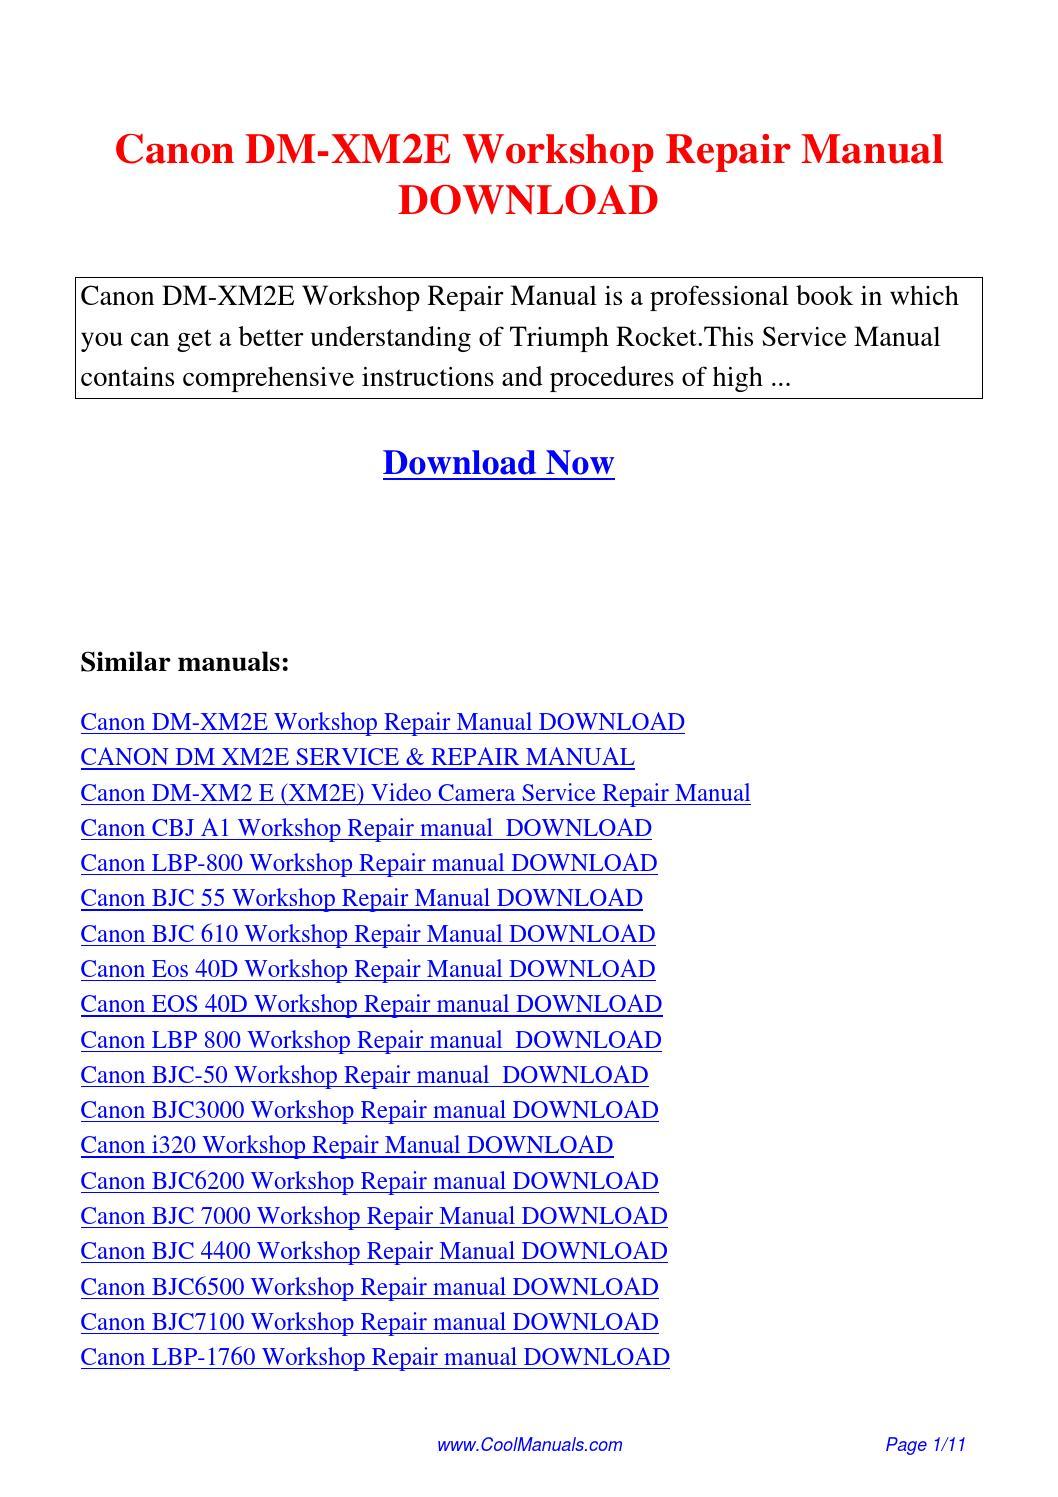 Canon Dm-xm2e Workshop Repair Manual Pdf By Linda Pong